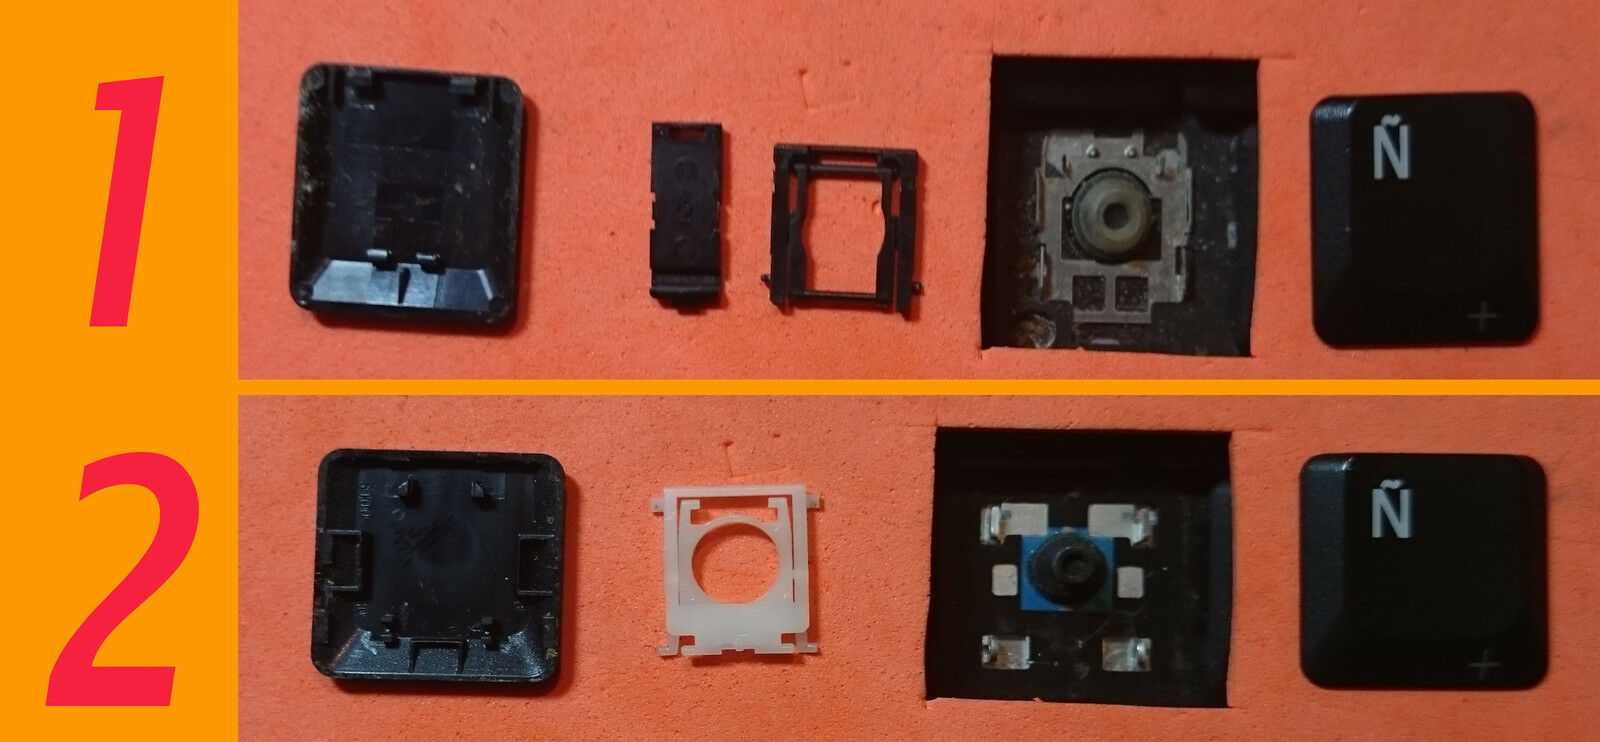 TECLA TECLAS DE TECLADO TOSHIBA SATELLLITE A80 A85 G15 M100 M105 M110